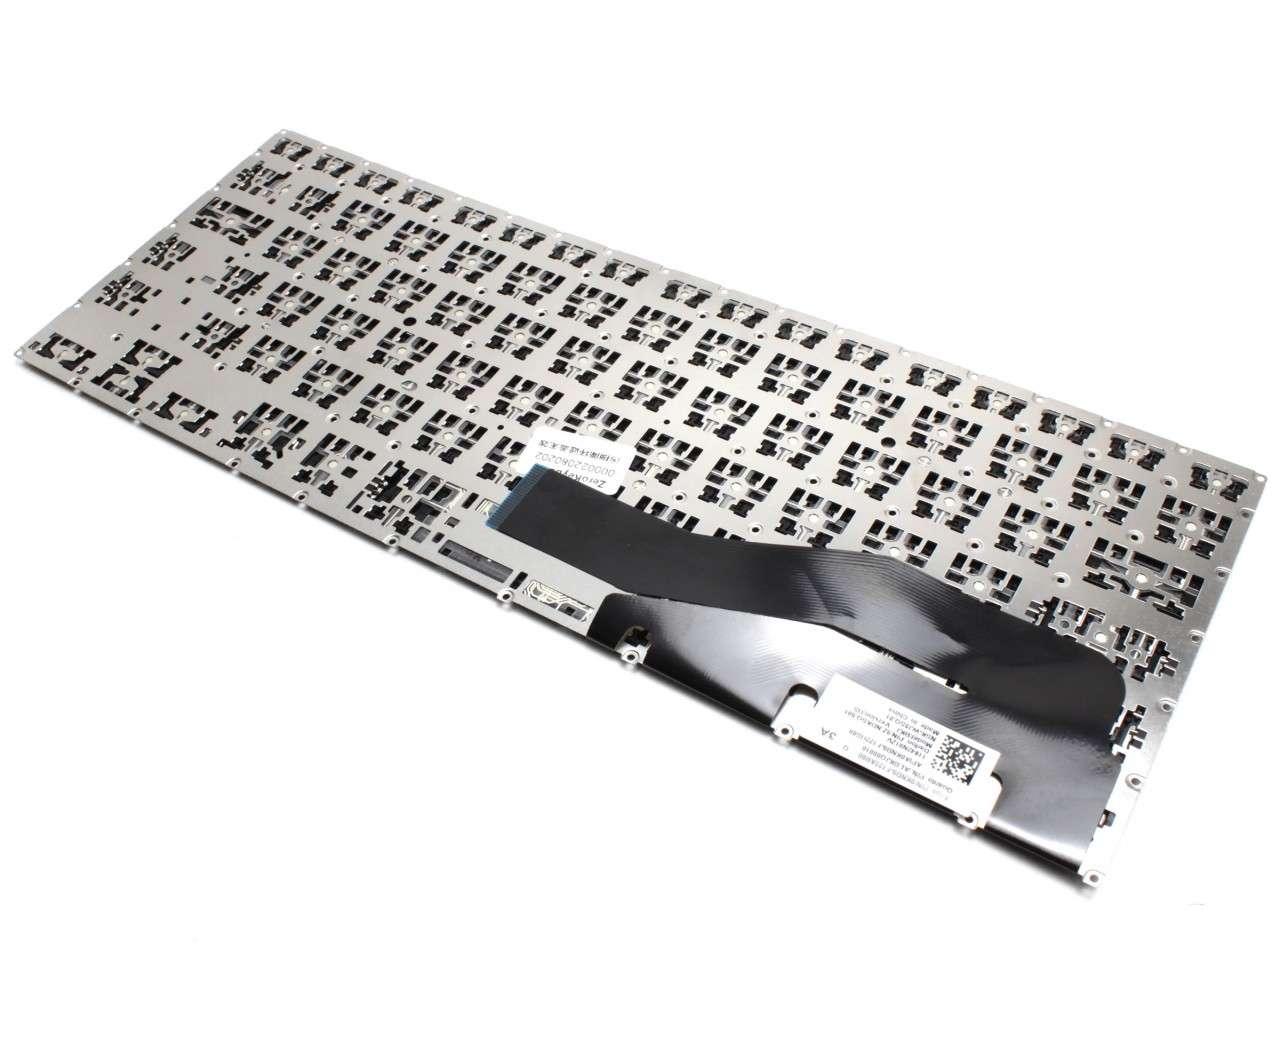 Tastatura Asus APIA0KNB0 layout US fara rama enter mic imagine